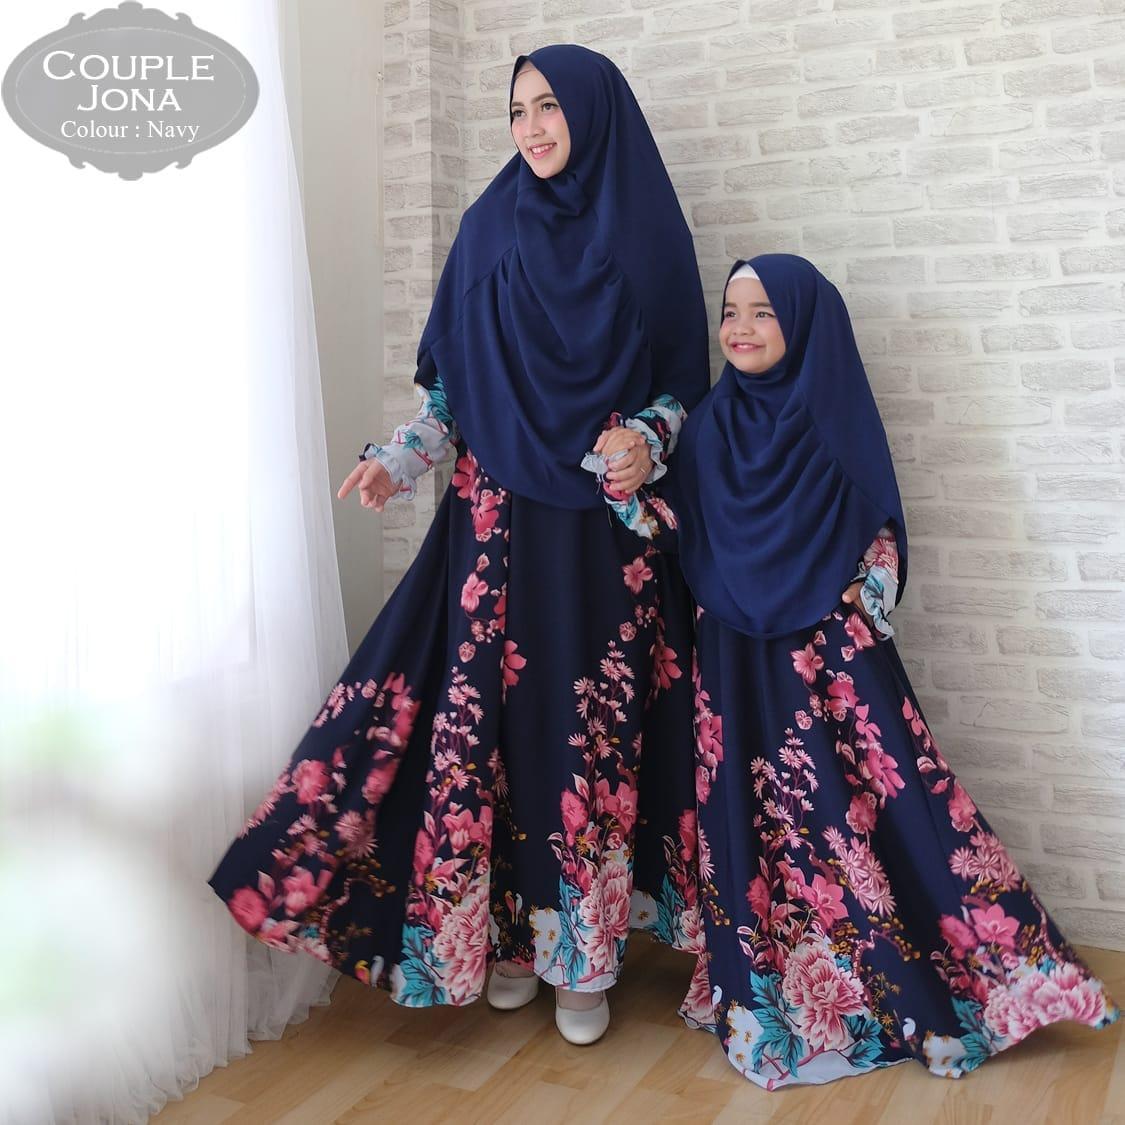 Kiara fashion gamis muslim syari couple jona ibu dan anak couple baju lebaran terbaru dan terkini fashionable